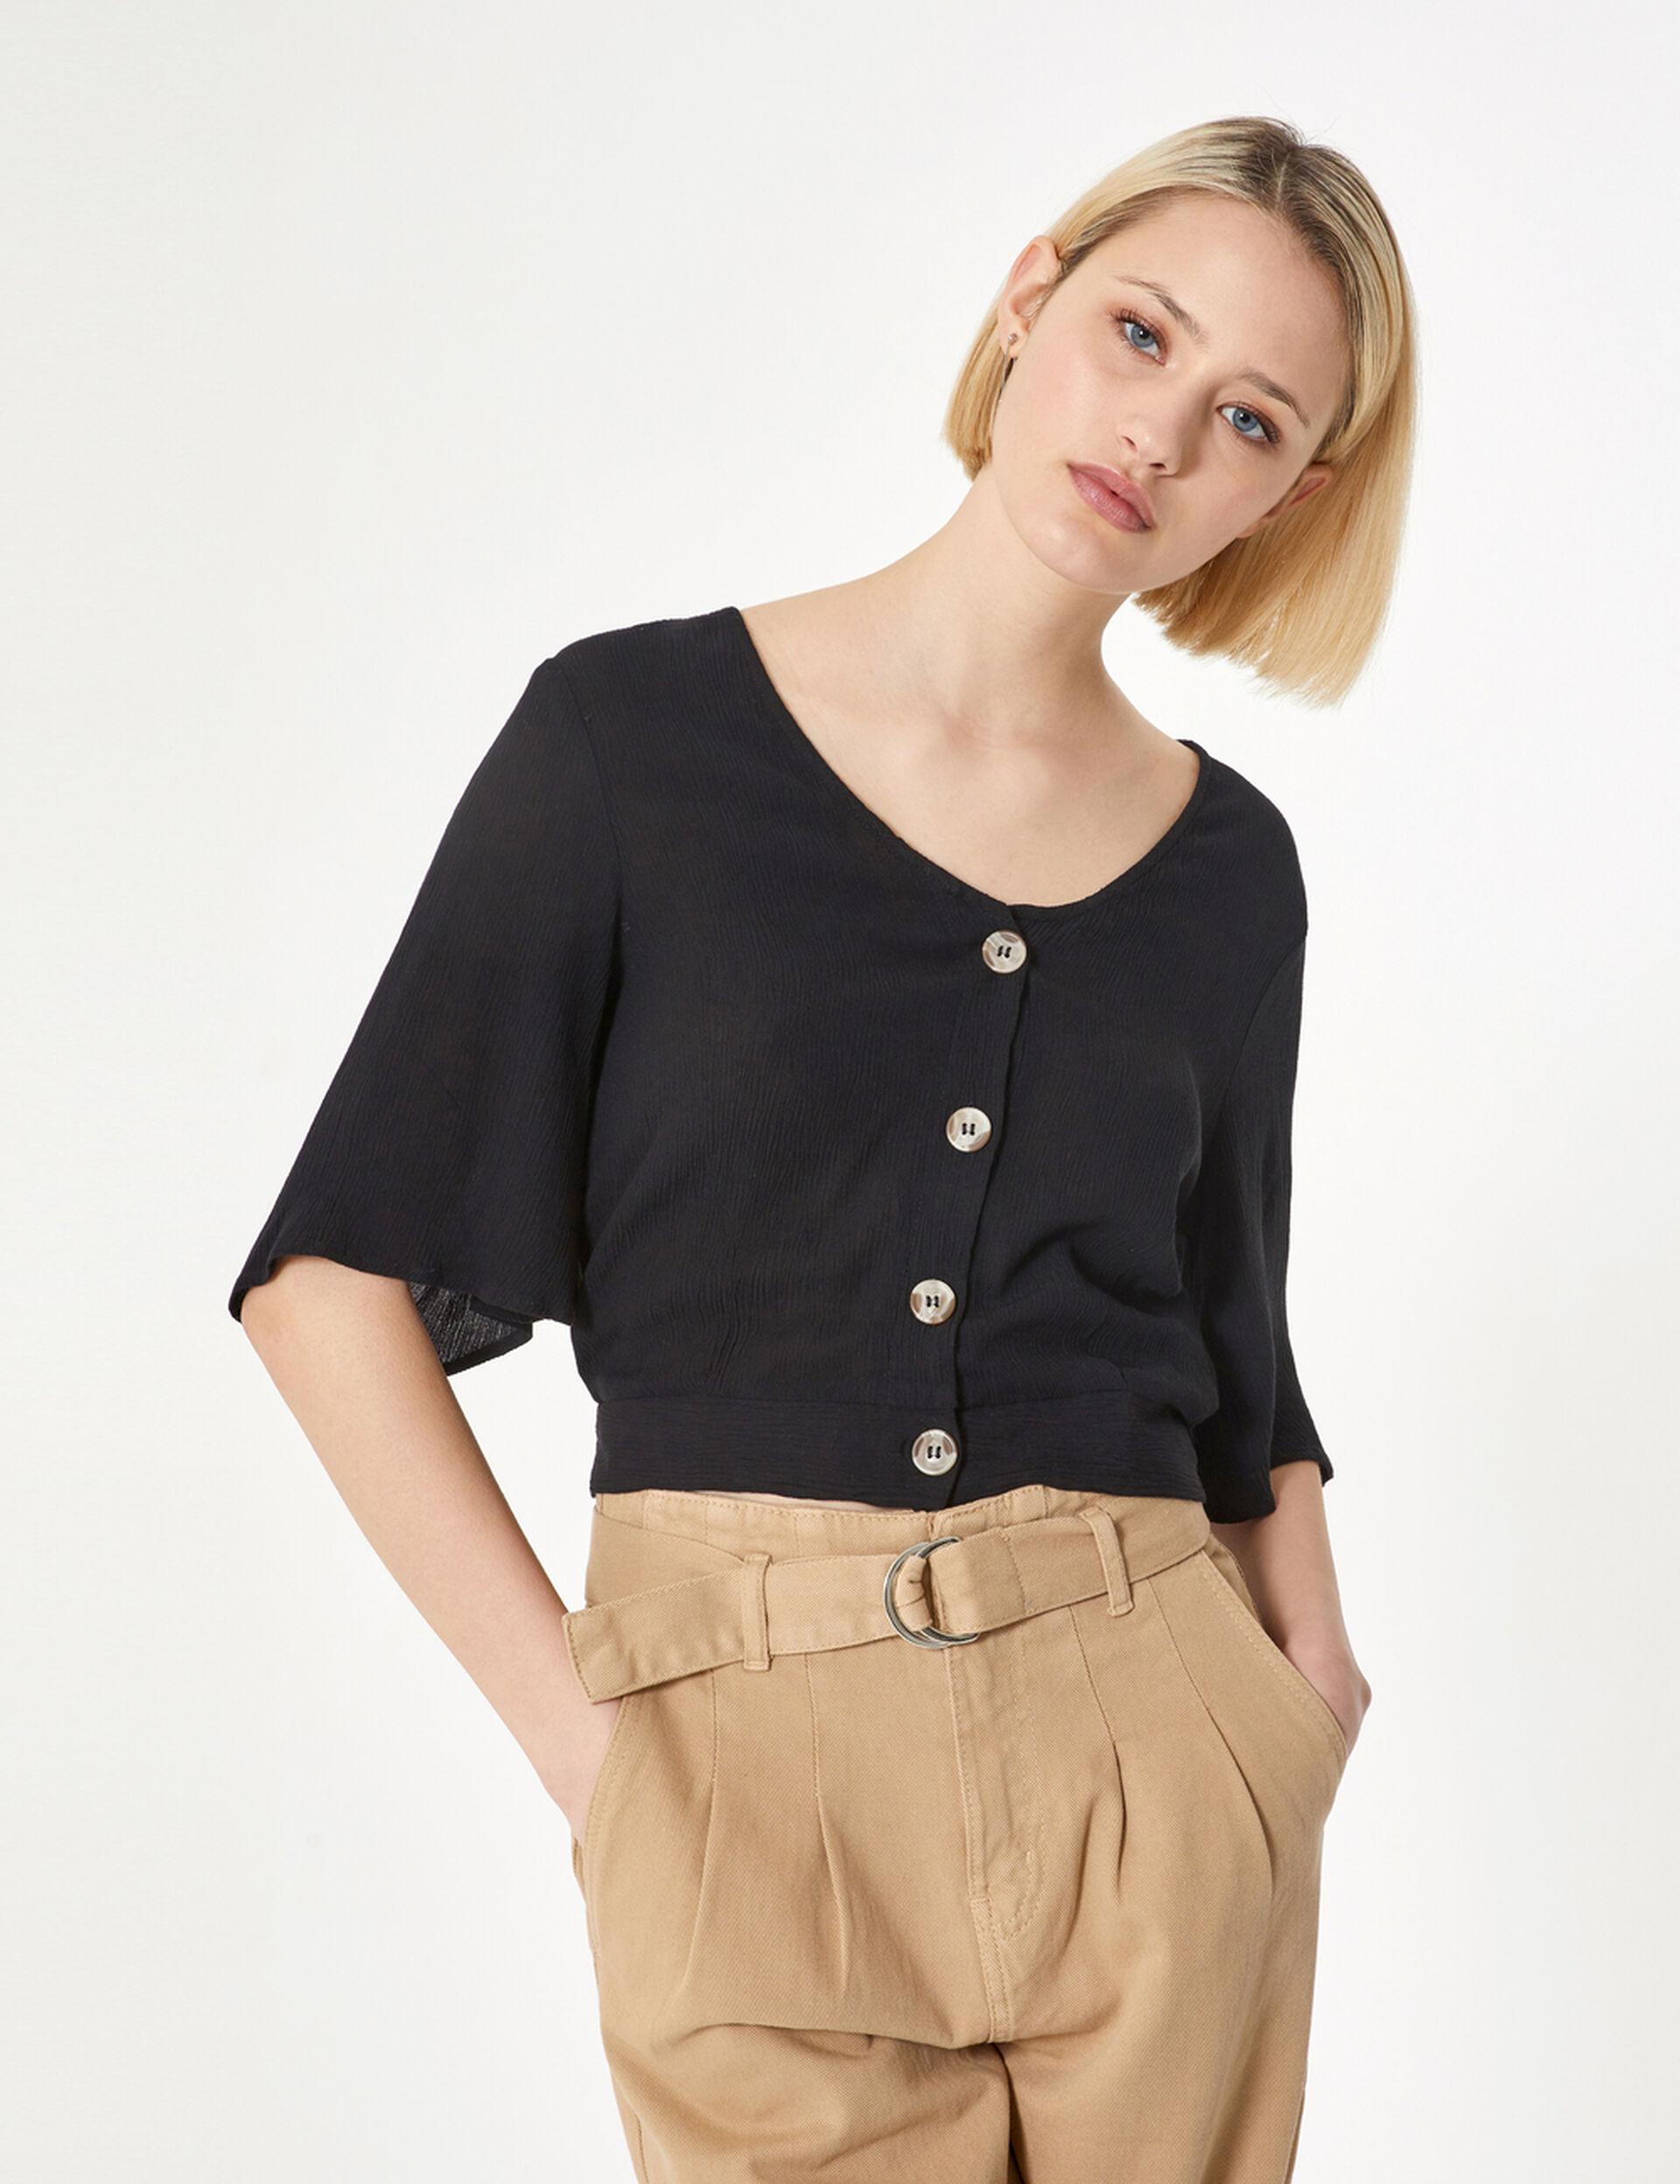 Black buttoned blouse